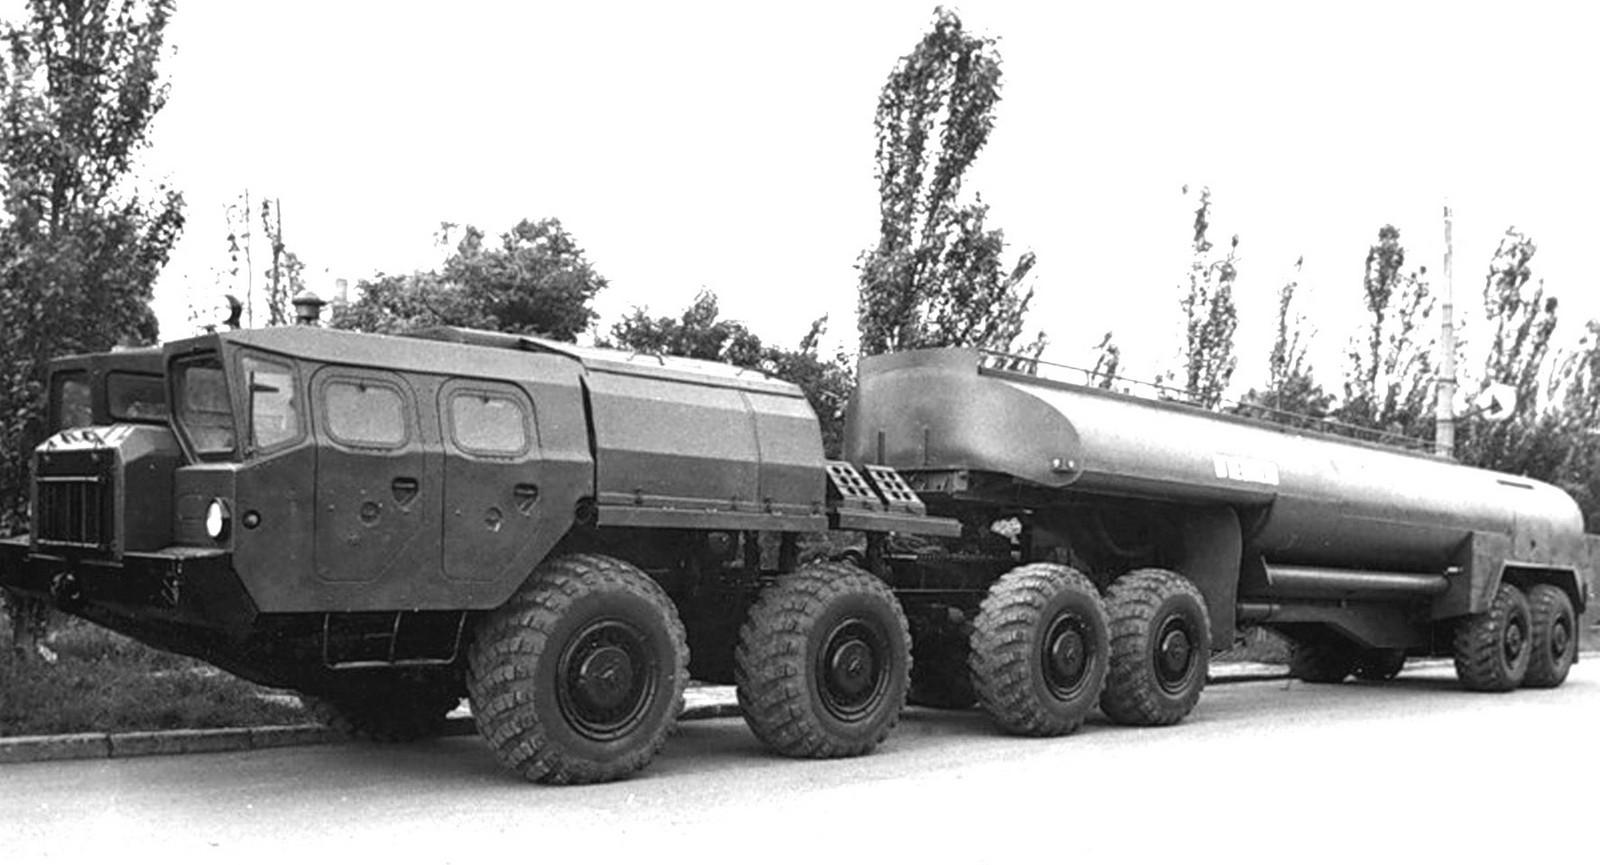 МАЗ-7410 с топливозаправщиком ТЗ-30 на шасси активного полуприцепа МАЗ-9989